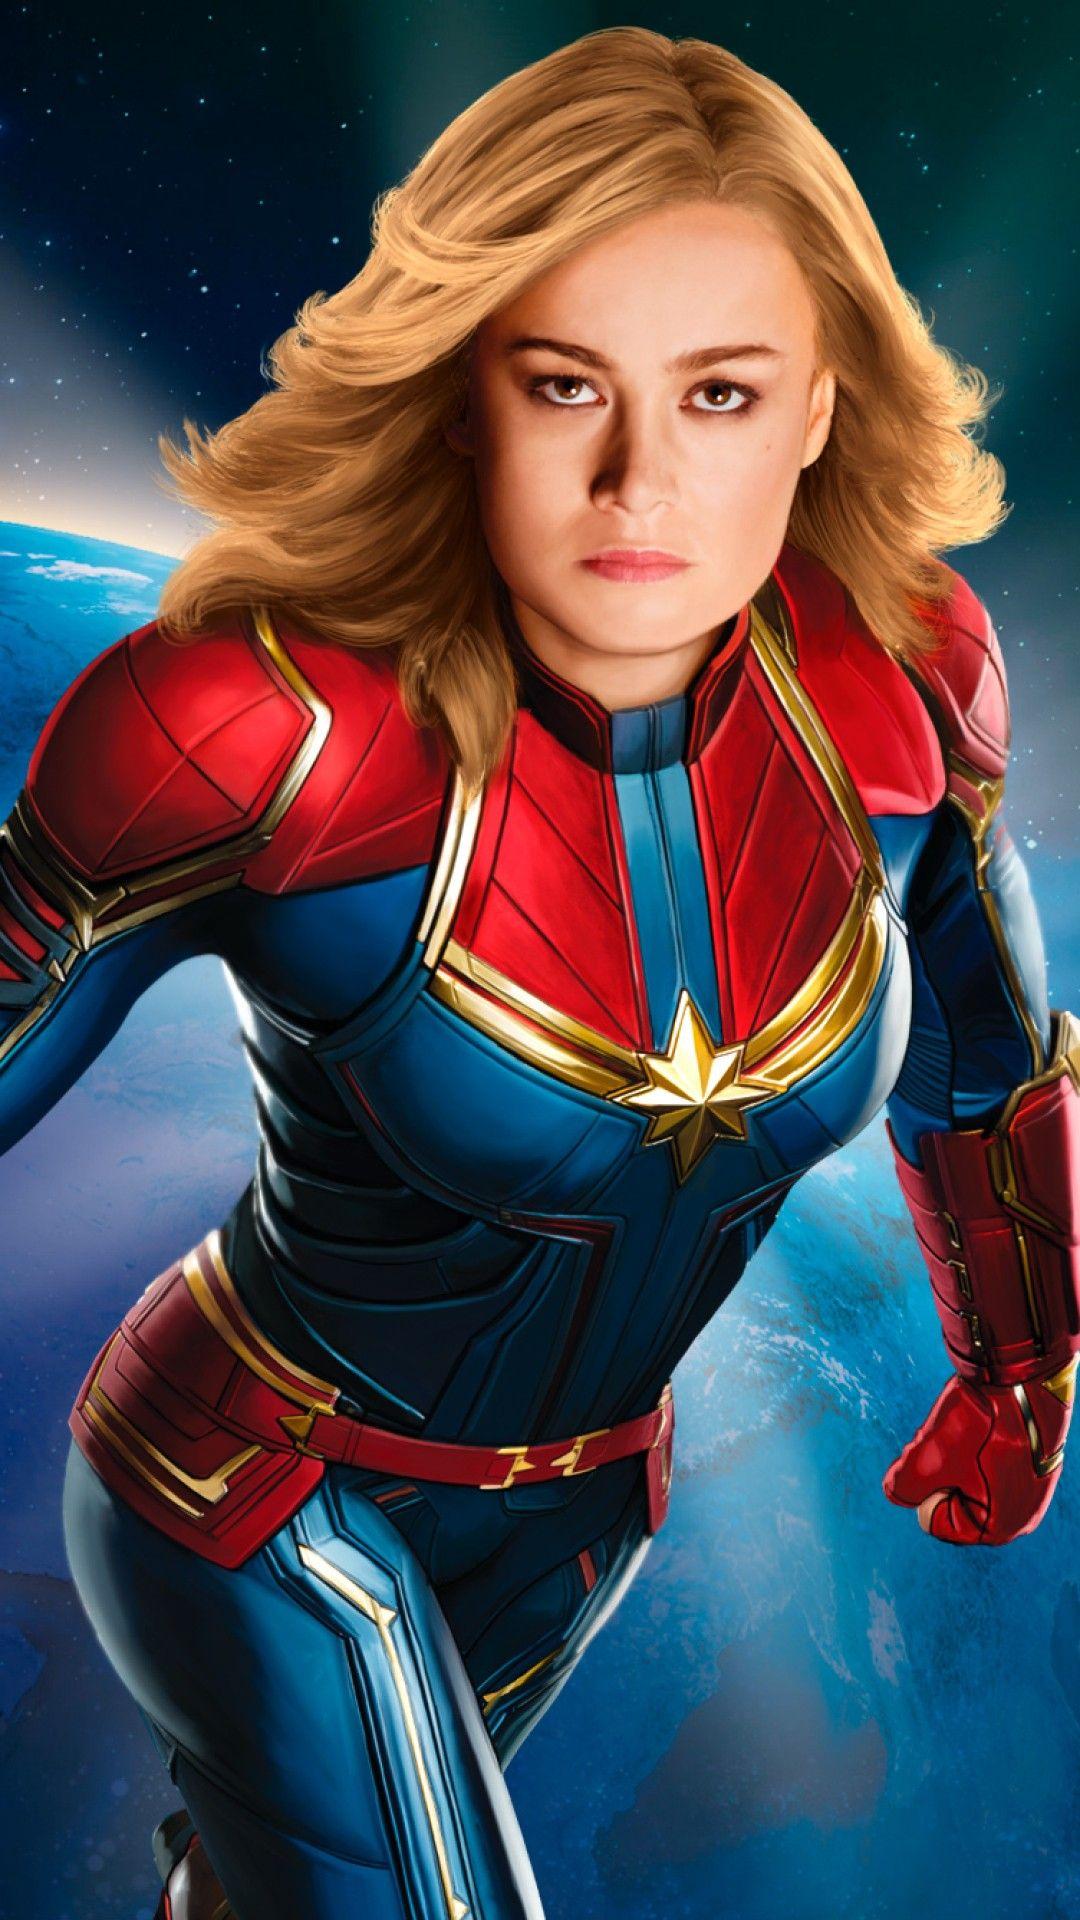 Wallpaper Phone Capita Marvel Full Hd Captain Marvel Captain Marvel Carol Danvers Marvel Heroes